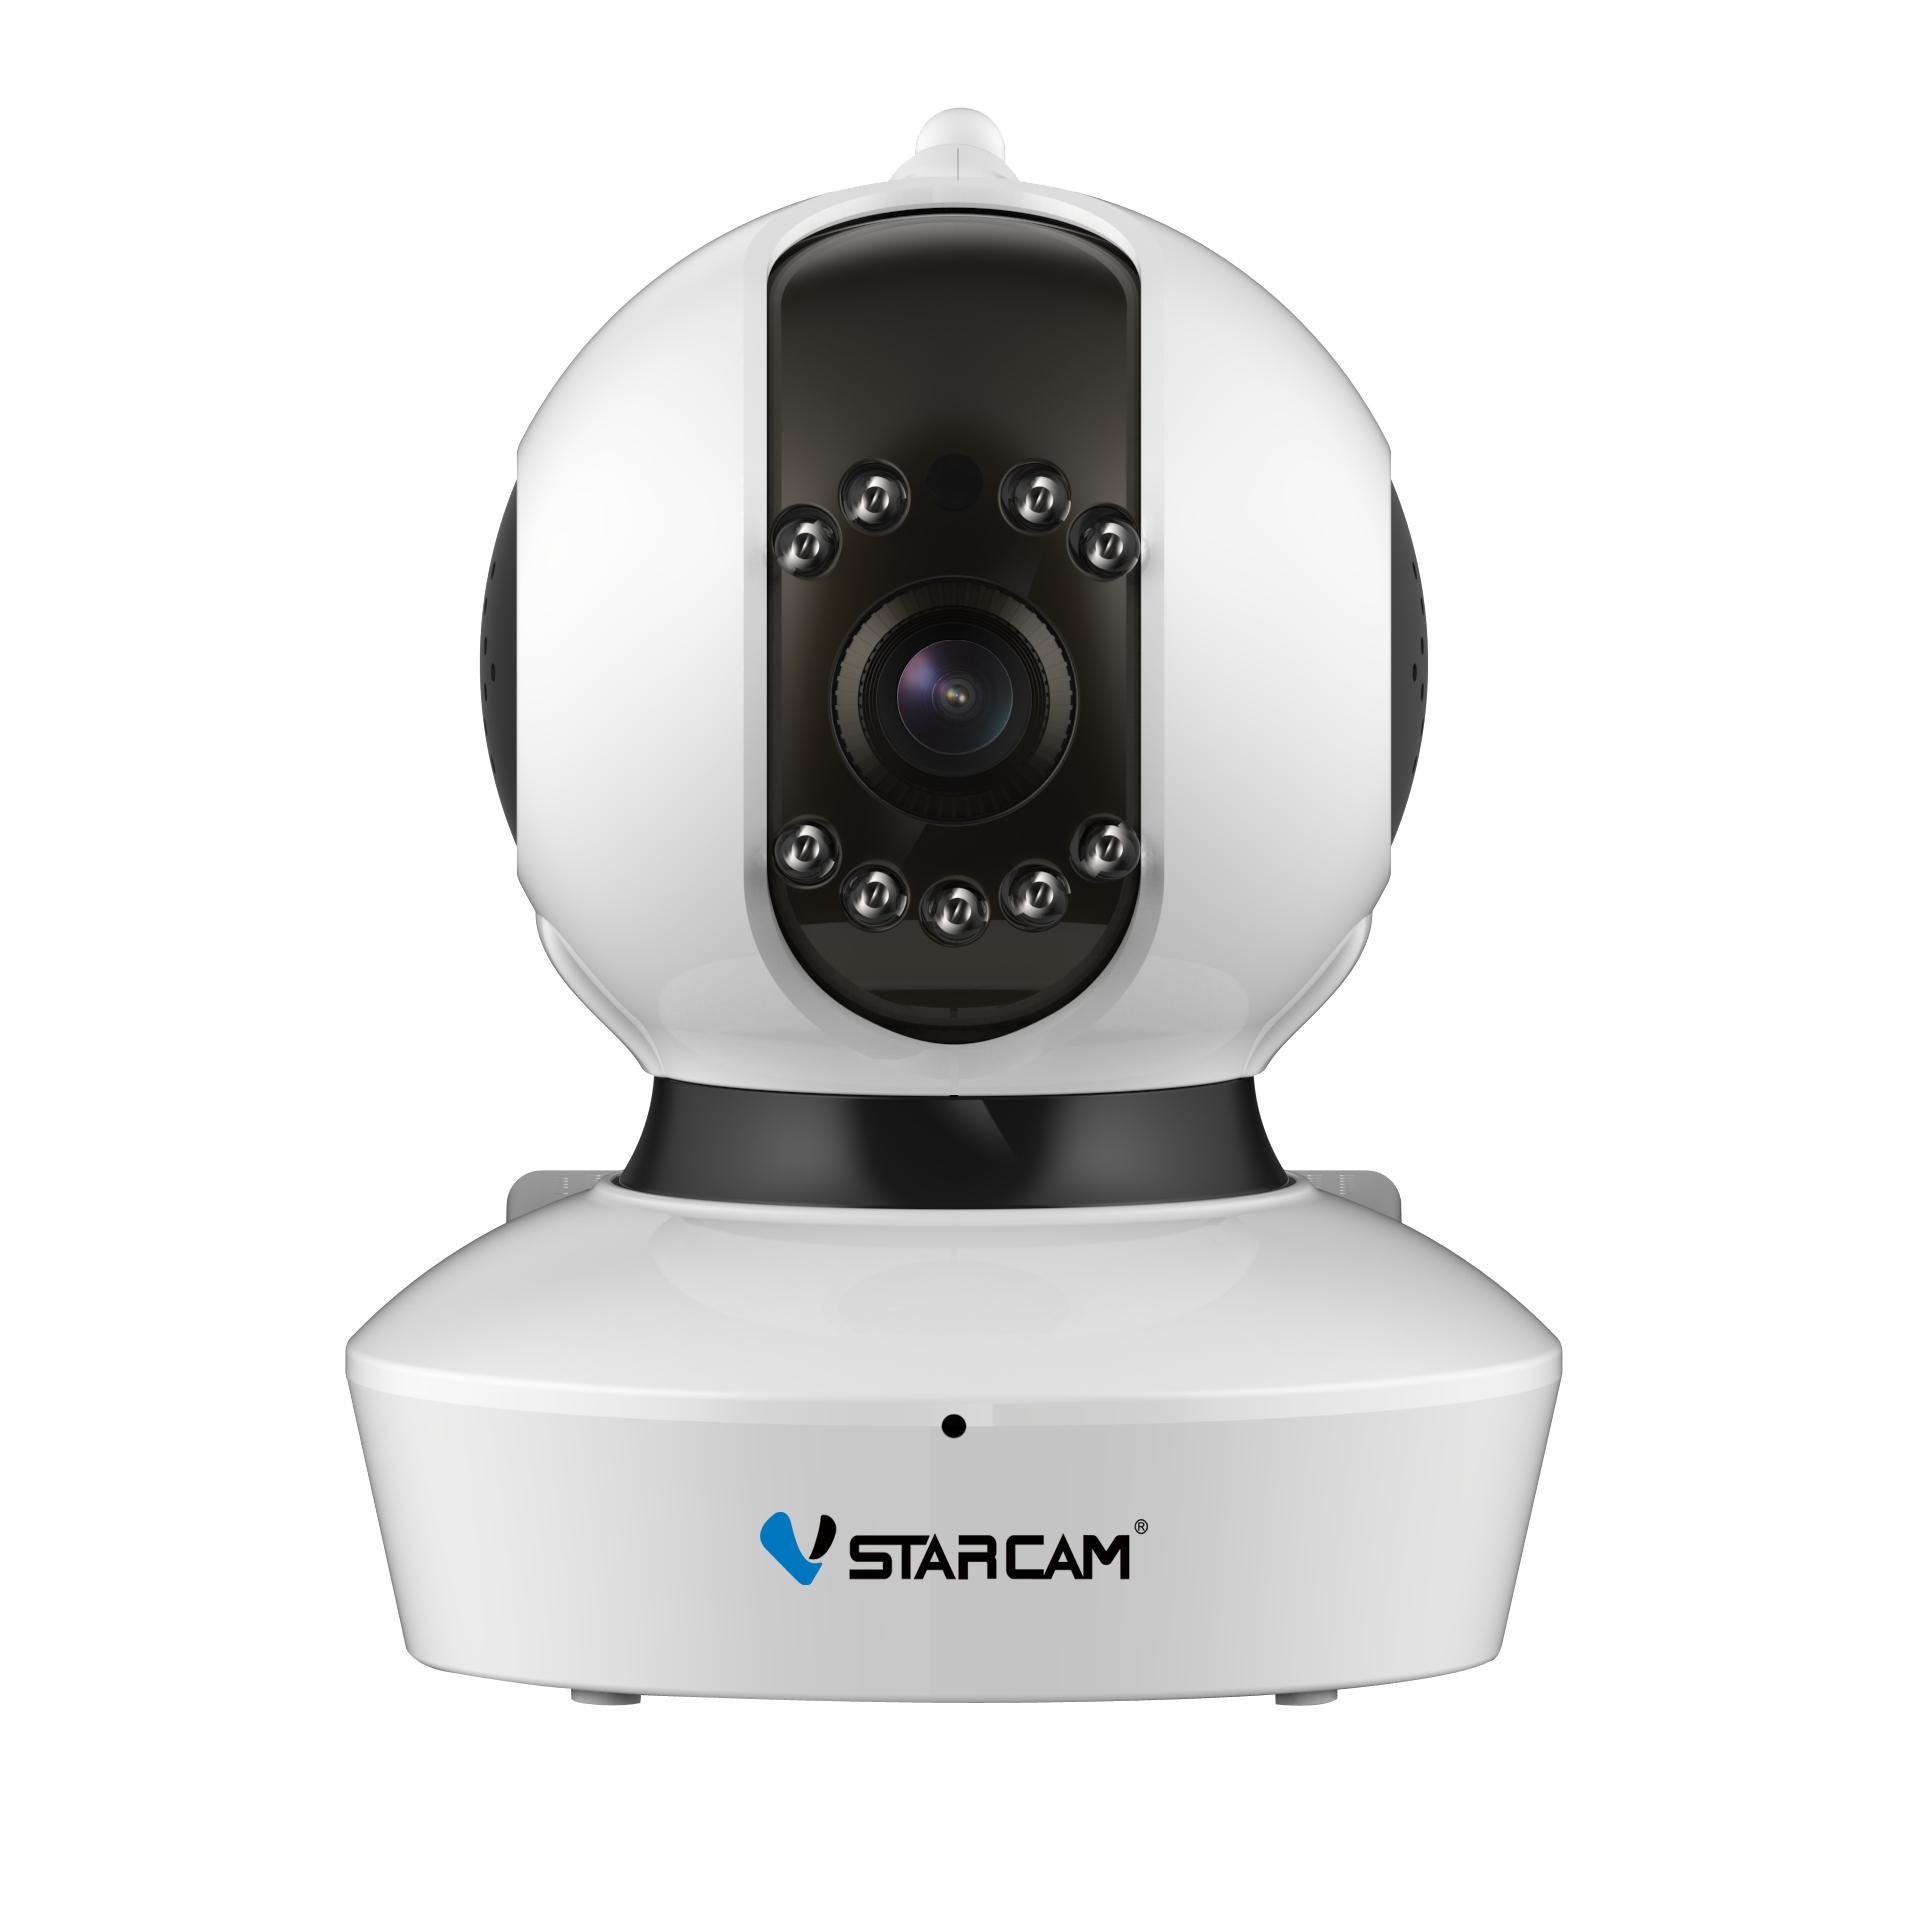 VStarcam 720P HD Cheaper WIFI IP Camera